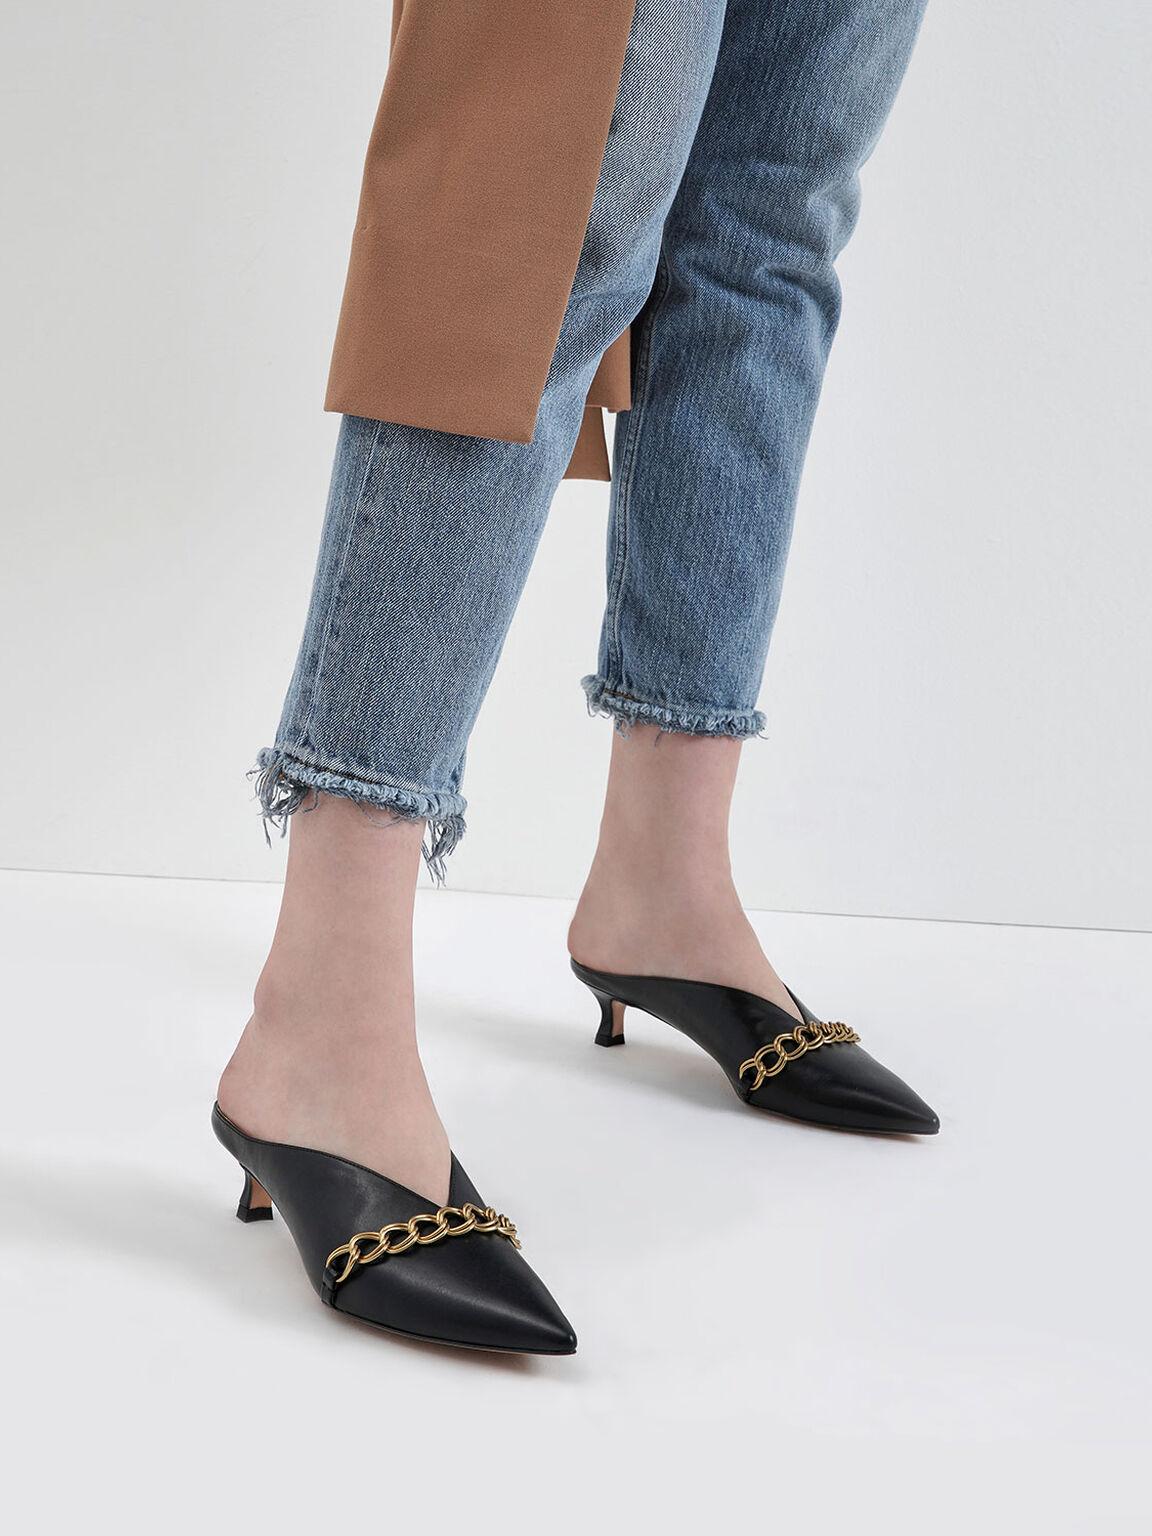 Chain Strap V-Cut Mules, Black, hi-res